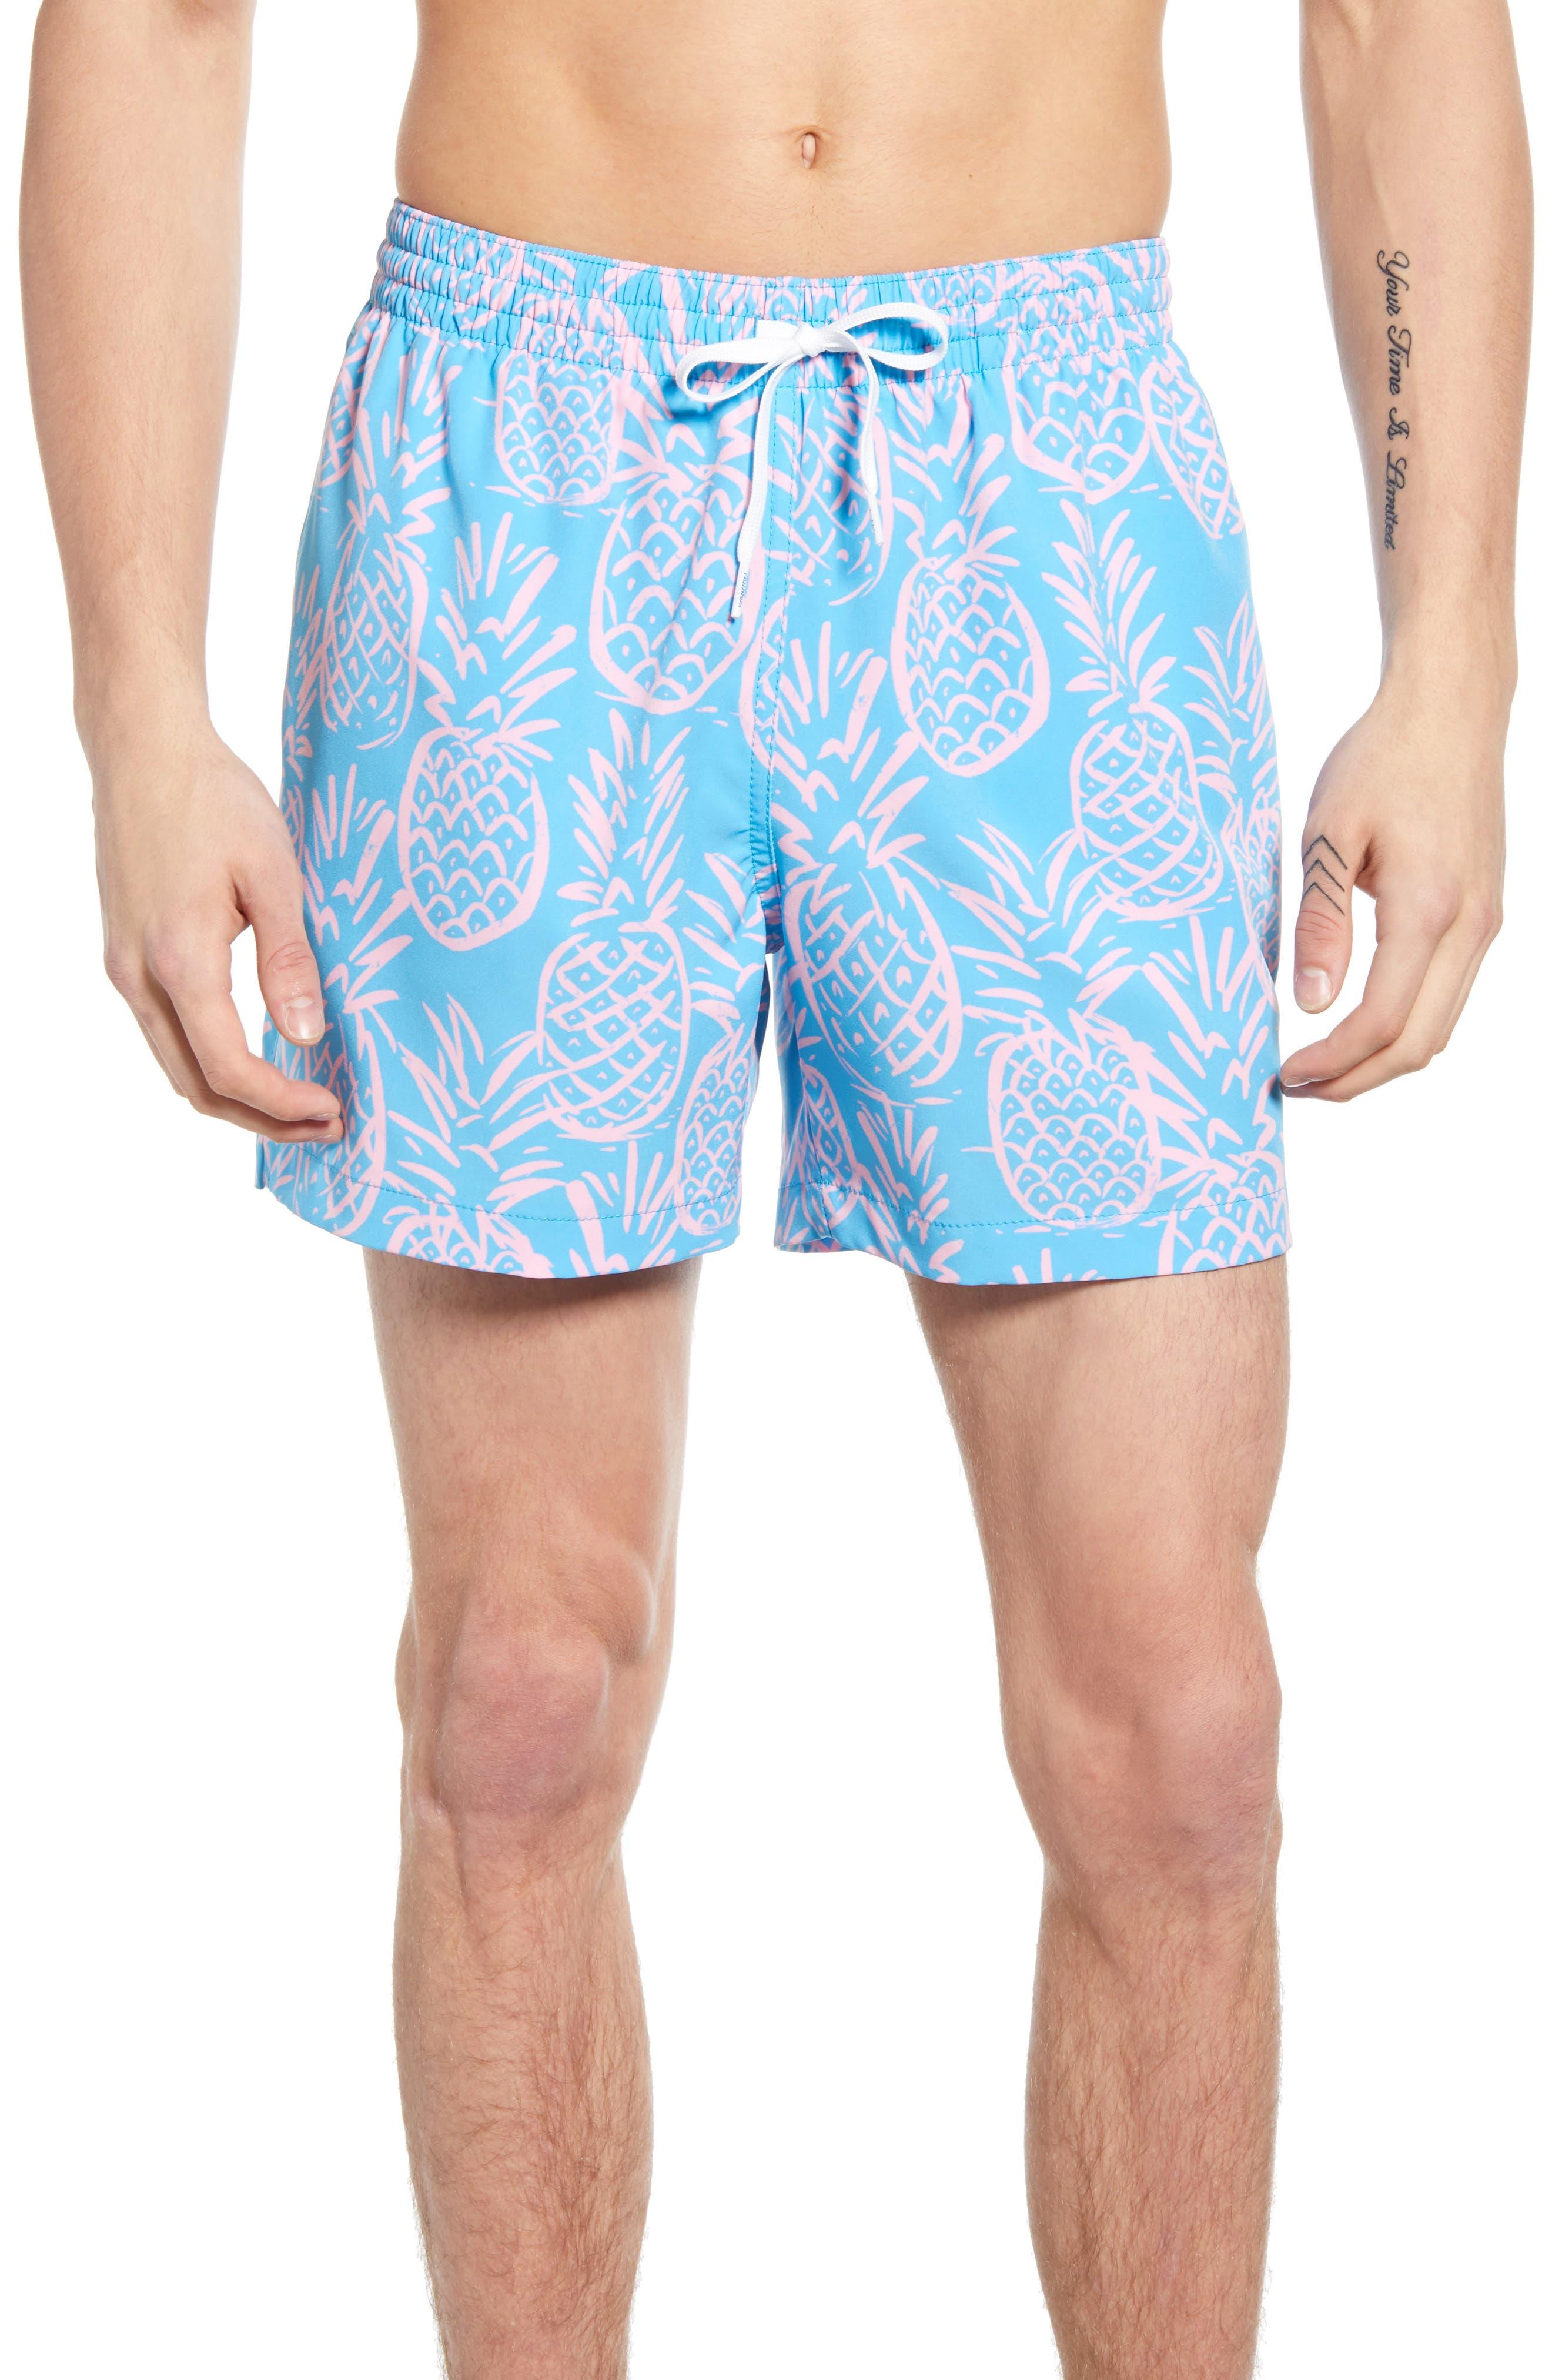 Chubbies Prickly Guys Print Swim Trunks, Blue